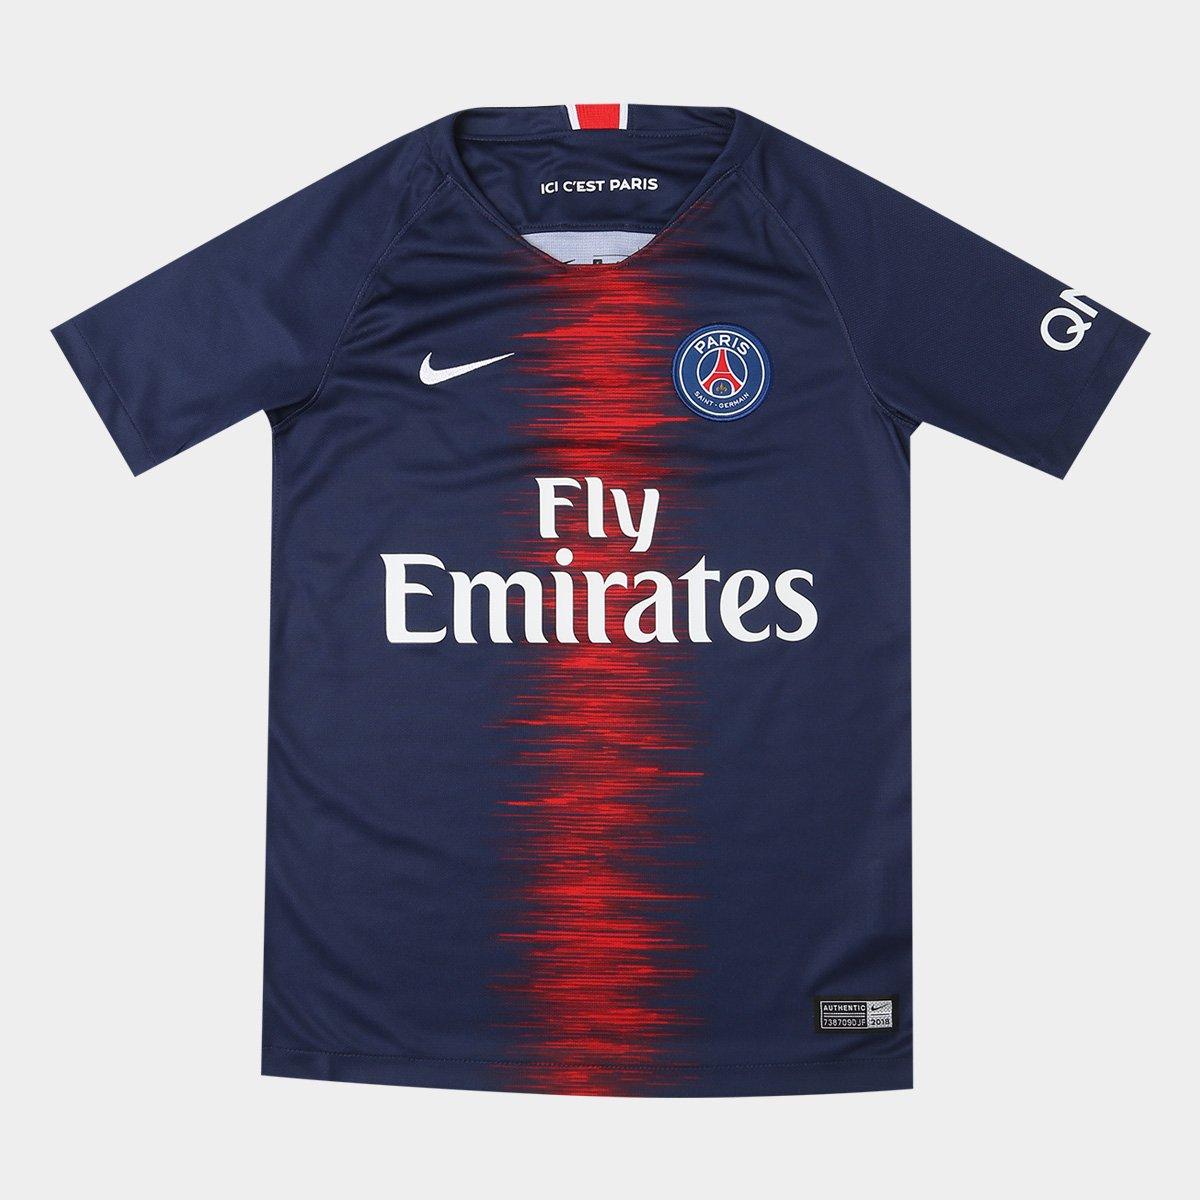 9938e9ffb5dc2 Camisa Paris Saint-Germain Juvenil Home 18 19 s n° Torcedor Nike - Azul -  Compre Agora